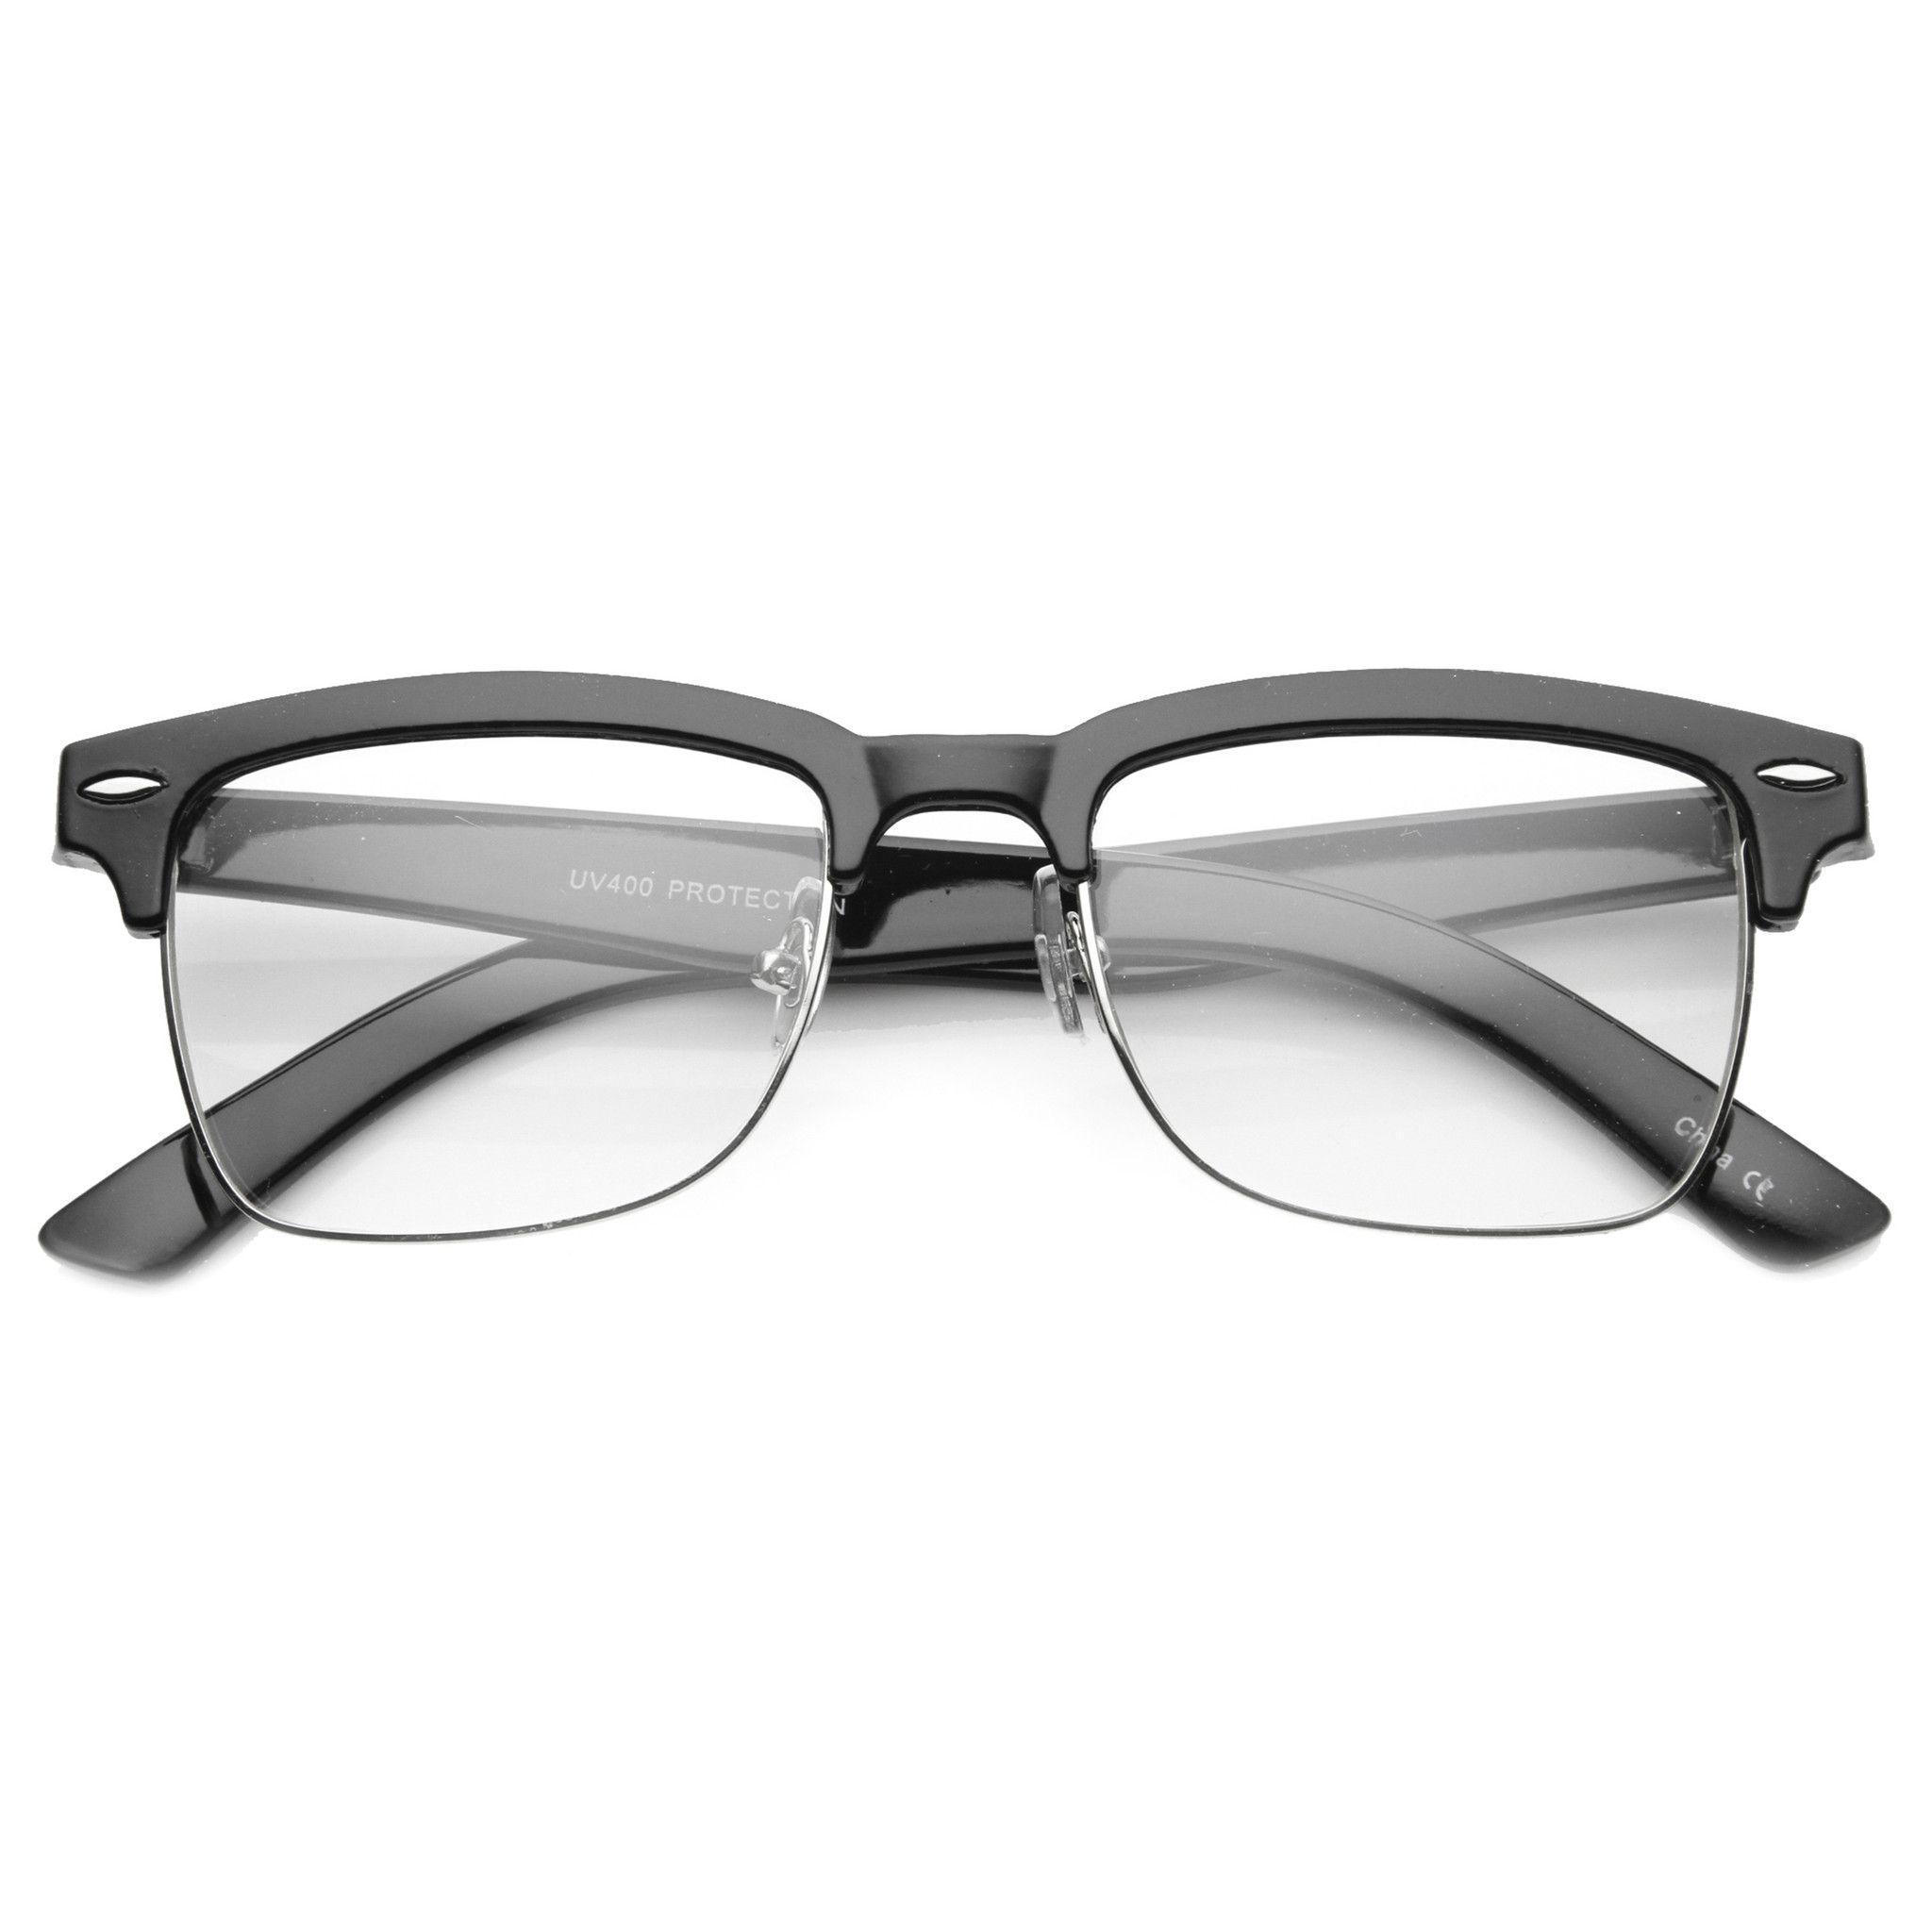 ac327204a1a Vintage Hipster Dapper Indie Half Frame Clear Lens Glasses 9810 ...